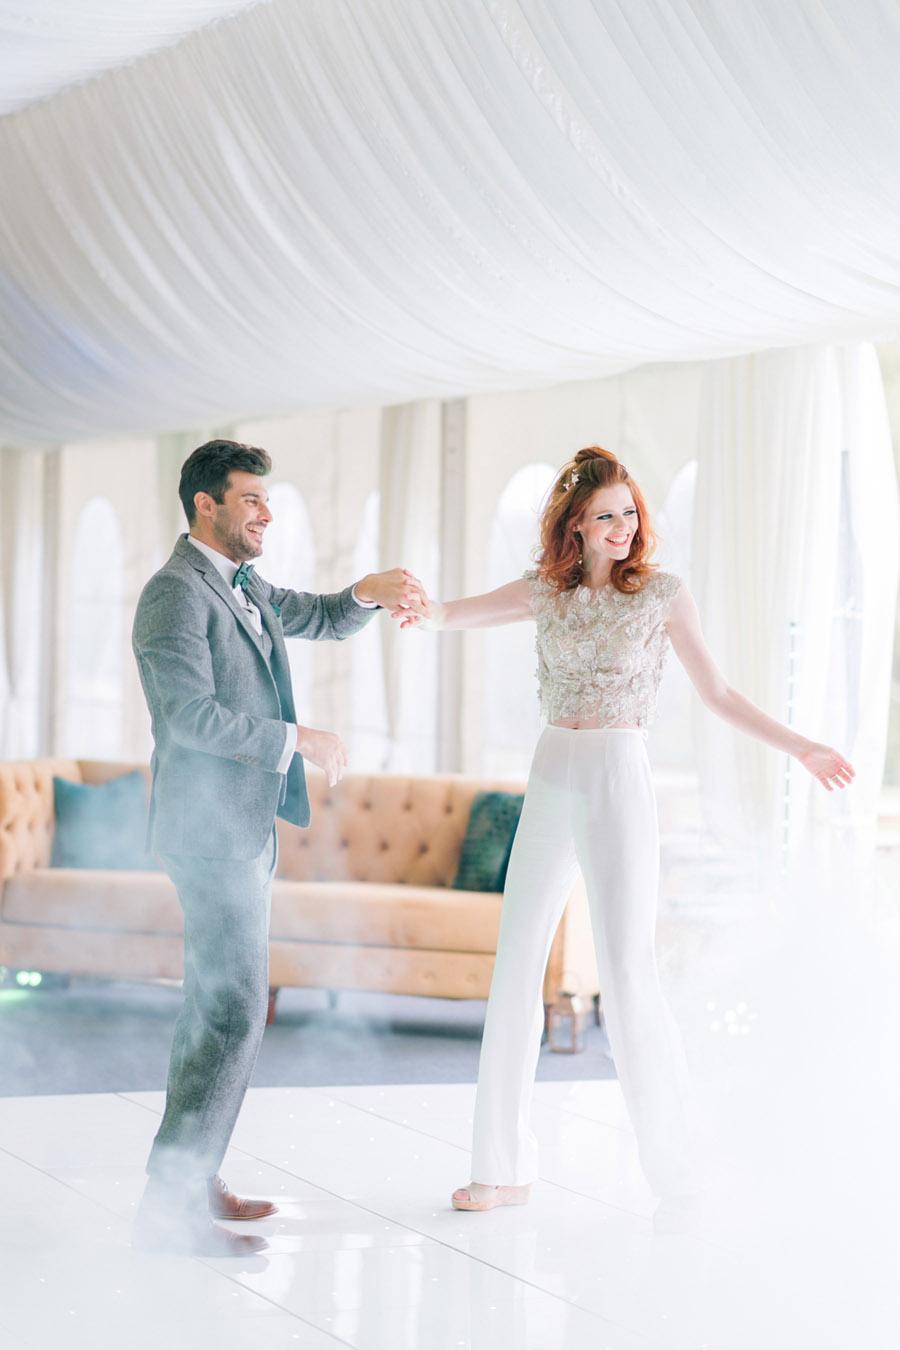 Beautiful emerald green and mustard wedding style ideas, photography by Ioana Porav (2)